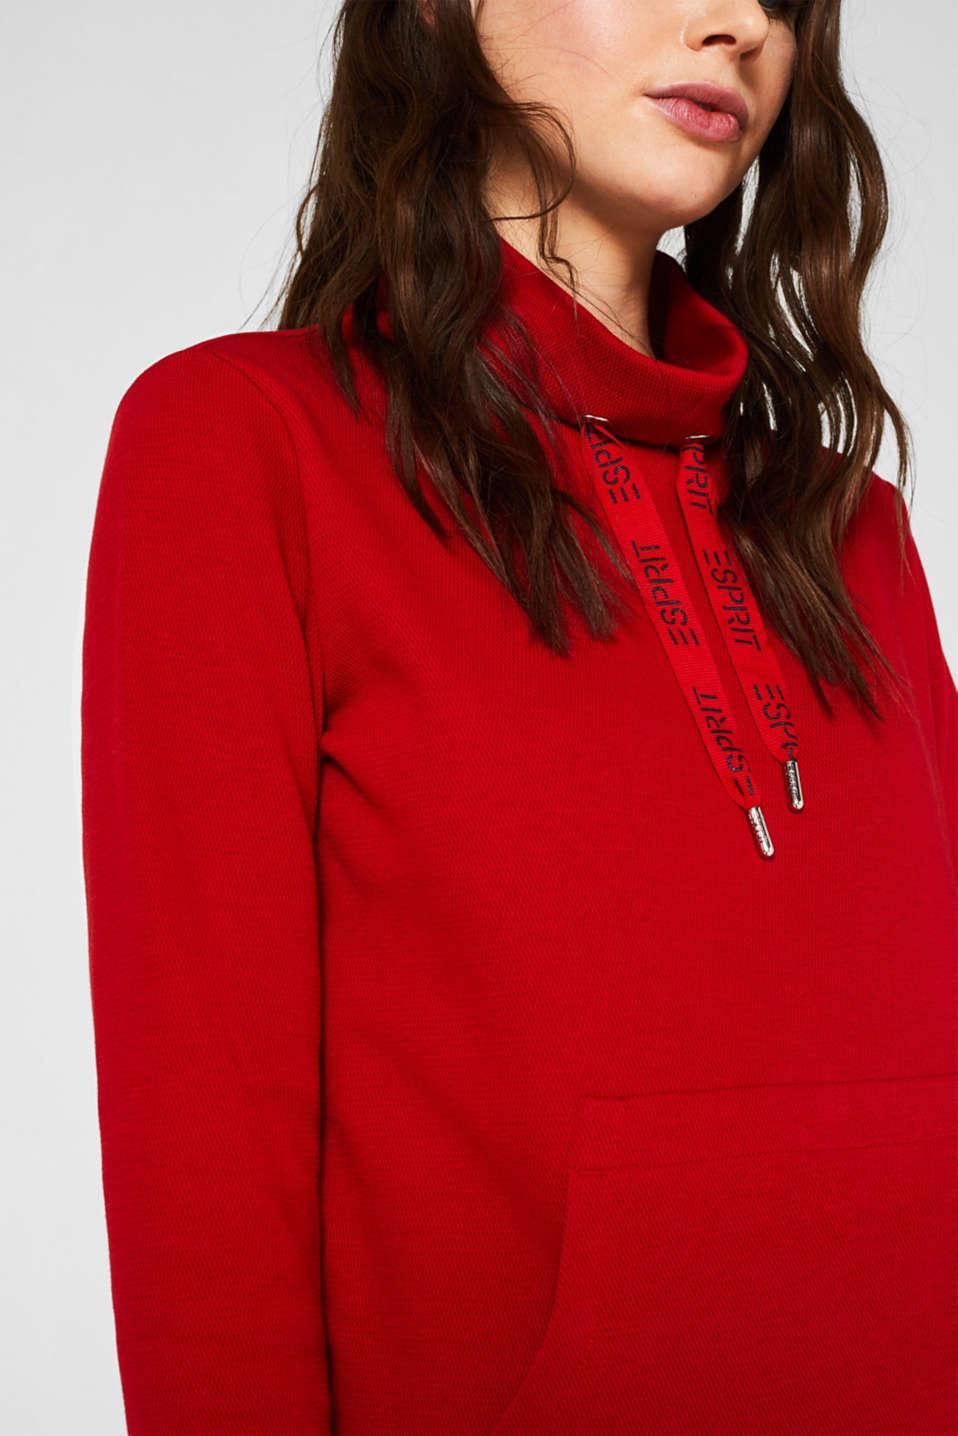 Piqué texture sweatshirt, DARK RED, detail image number 2